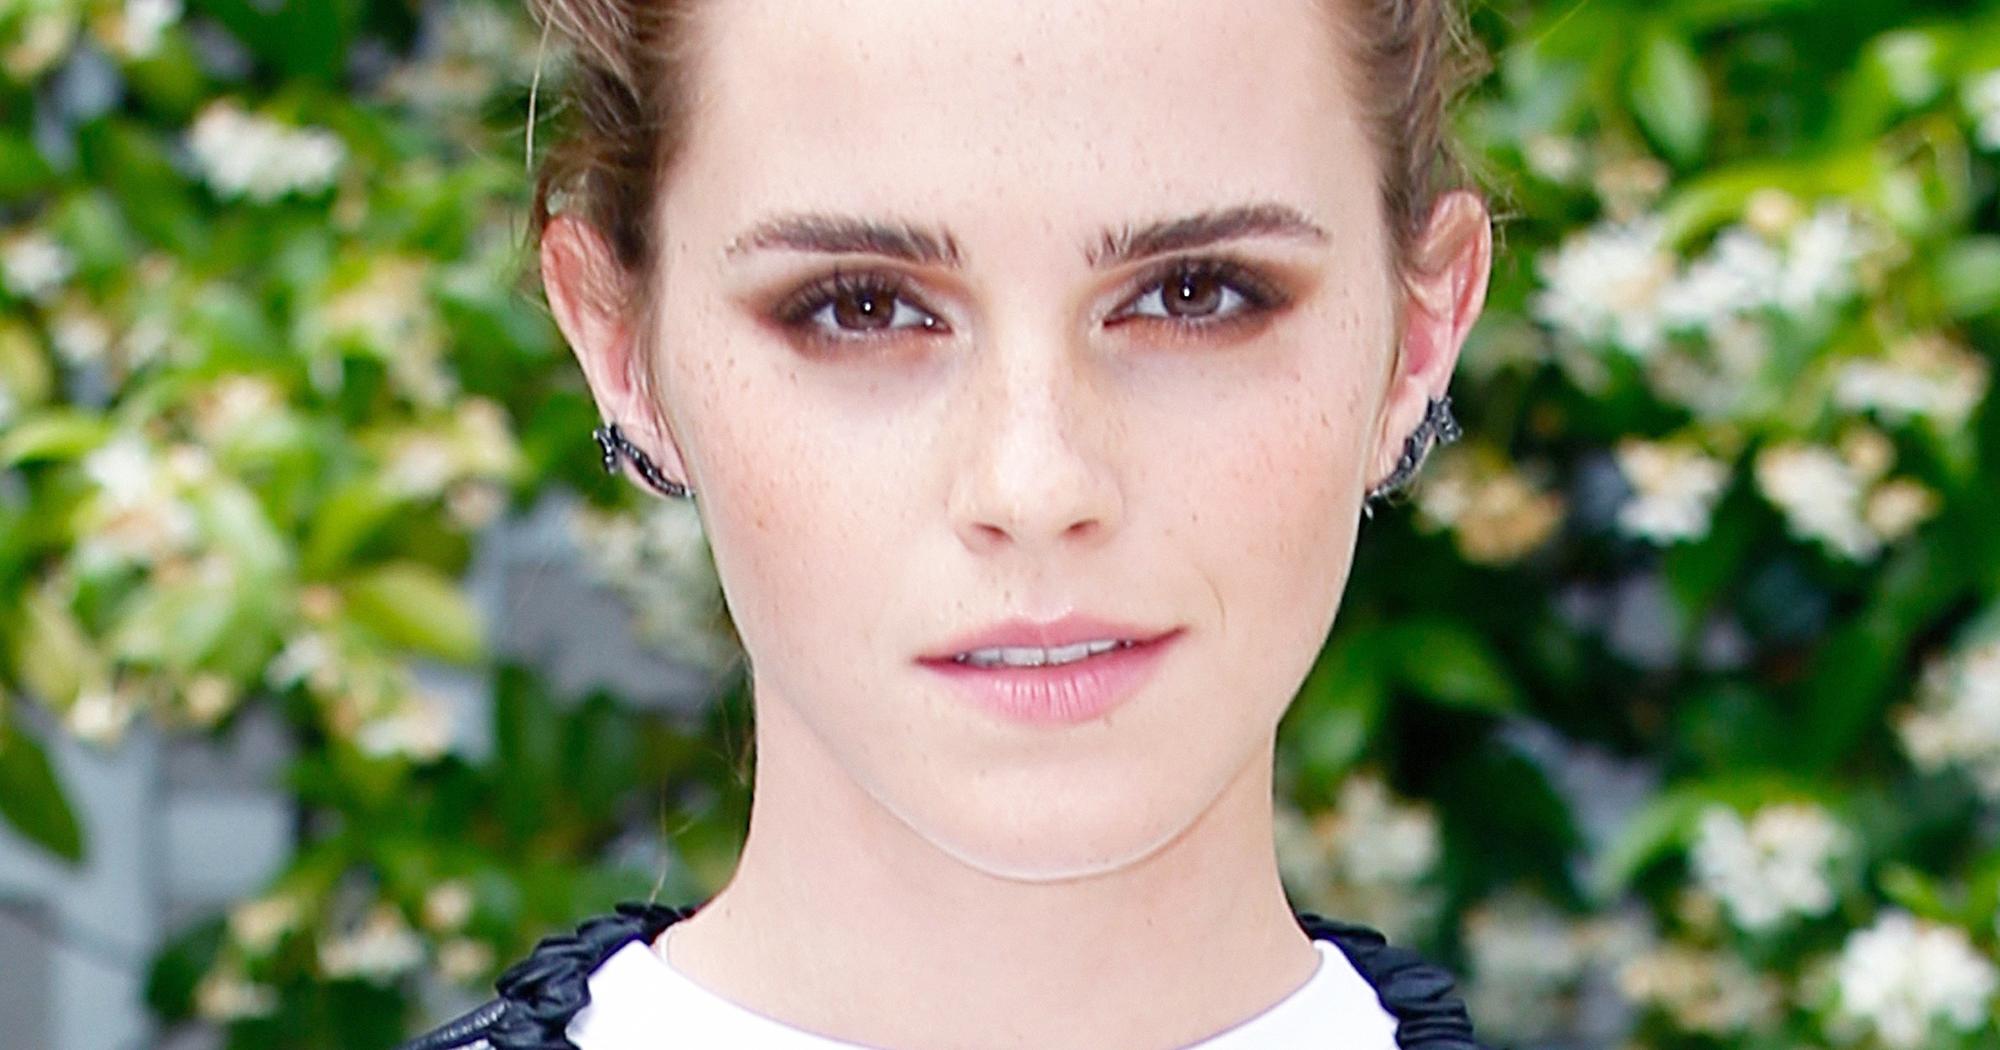 Emma Watson Male Makeup Video Transformation Instagram